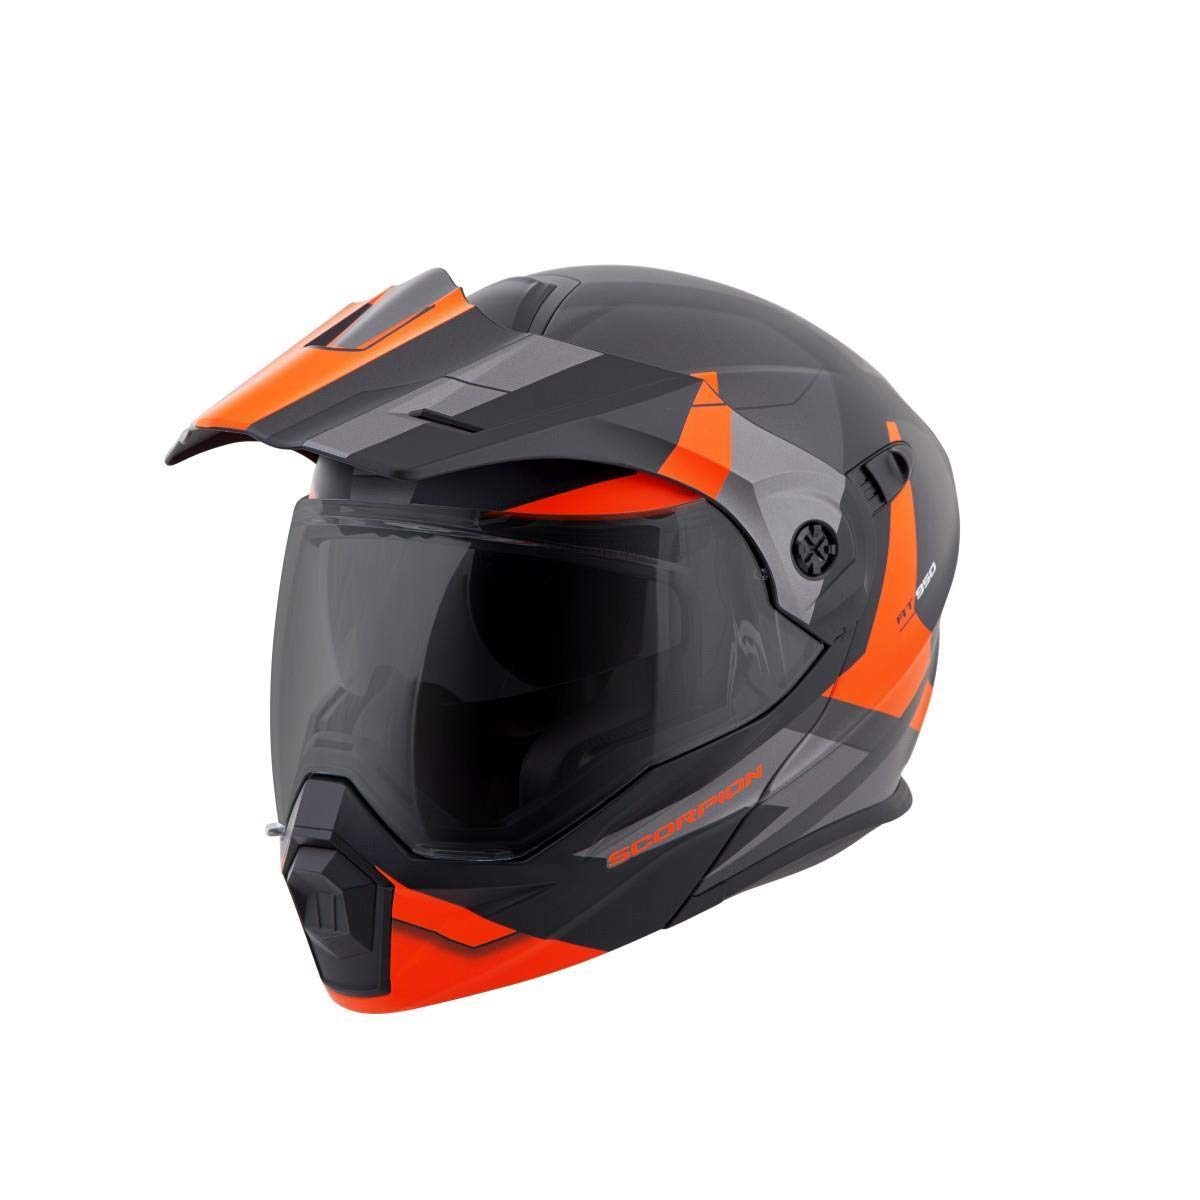 95-1014 ScorpionEXO Unisex-Adult Modular//Flip Up Adventure Touring Motorcycle Helmet Hi-Viz, Medium EXO-AT950 Neocon